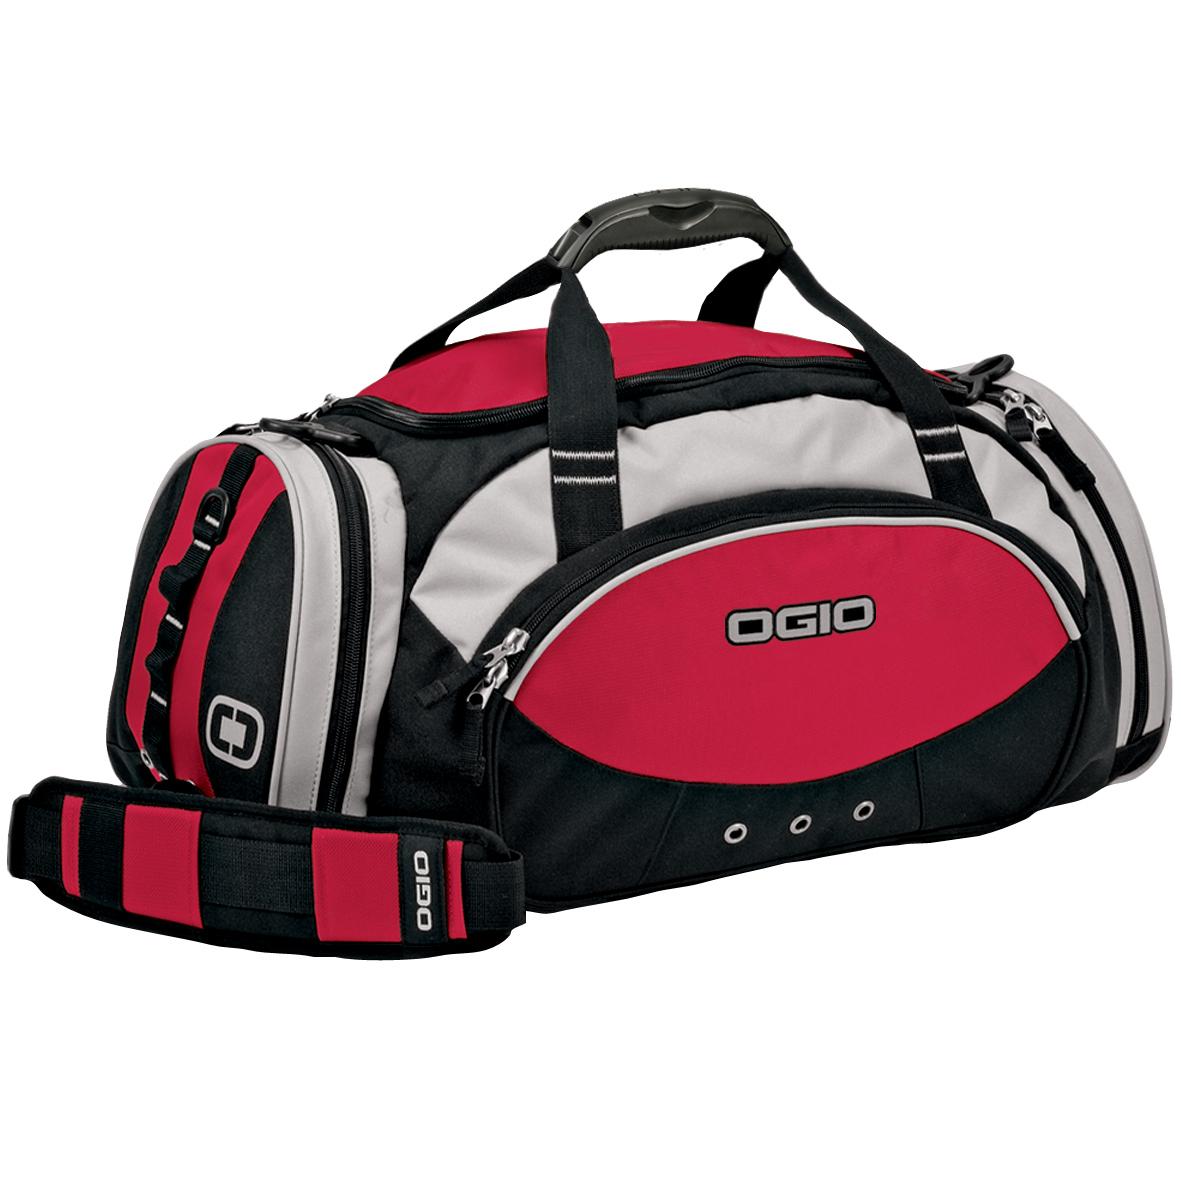 Brilliant USA Pro Womens Yoga Holdall Ladies Sports Bag Carry Handles Shoulder Strap Zip | EBay